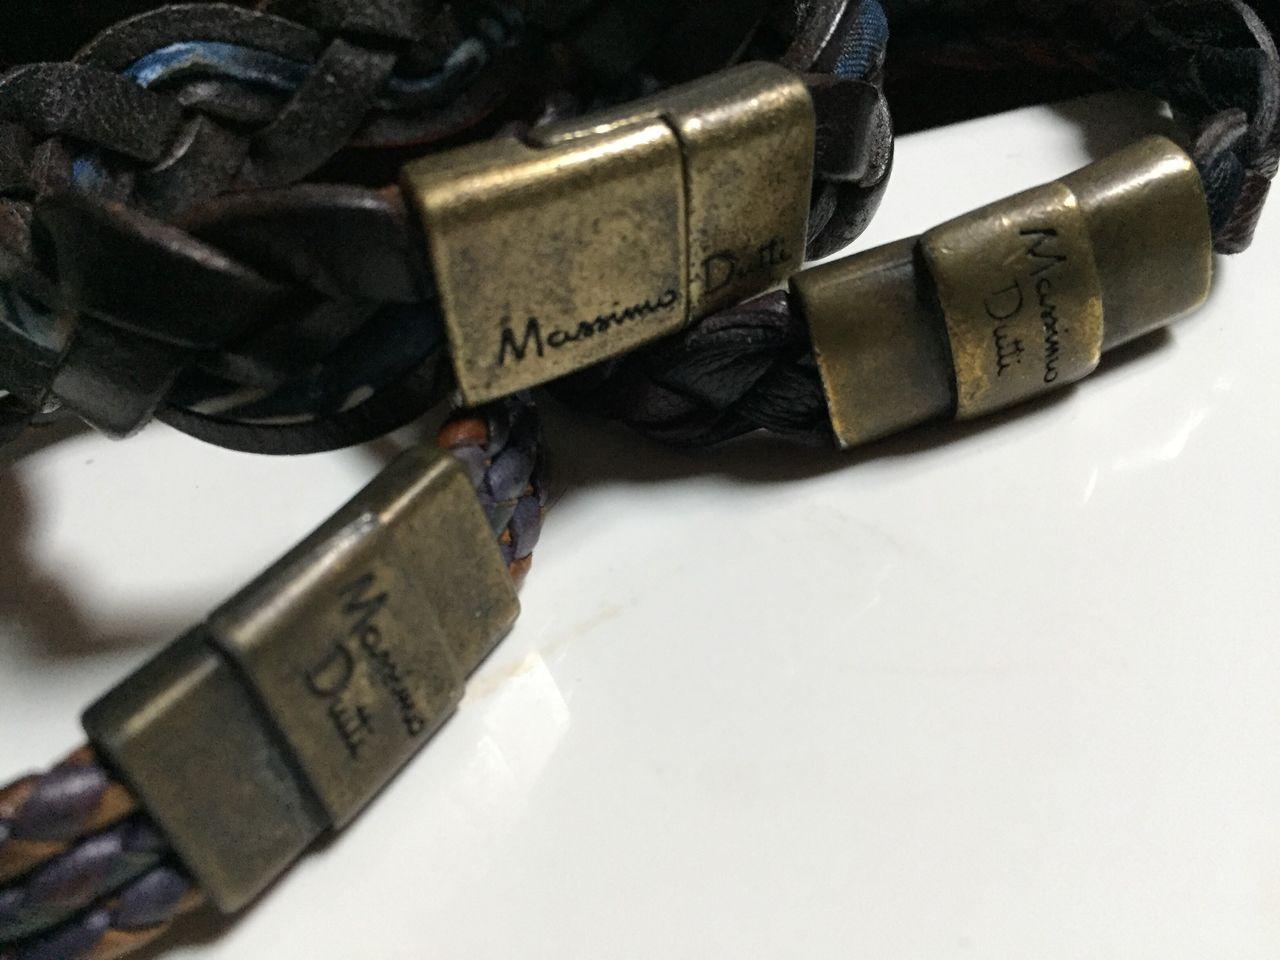 padlock, metal, text, communication, close-up, lock, no people, day